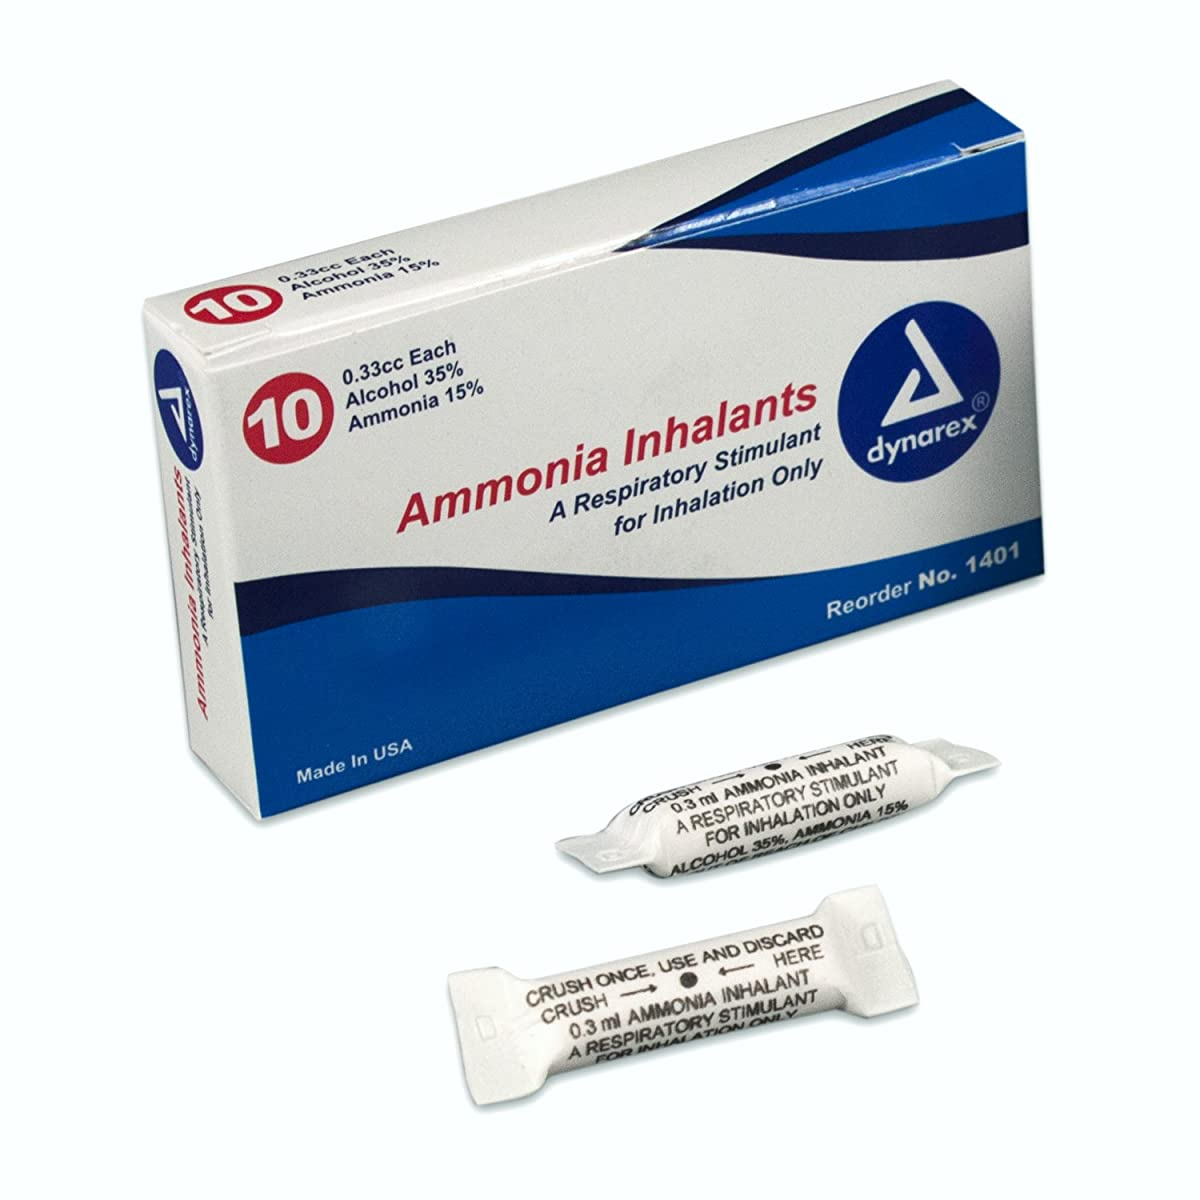 Dynarex Ammonia Inhalants, 33 Cc, 10 Ampules